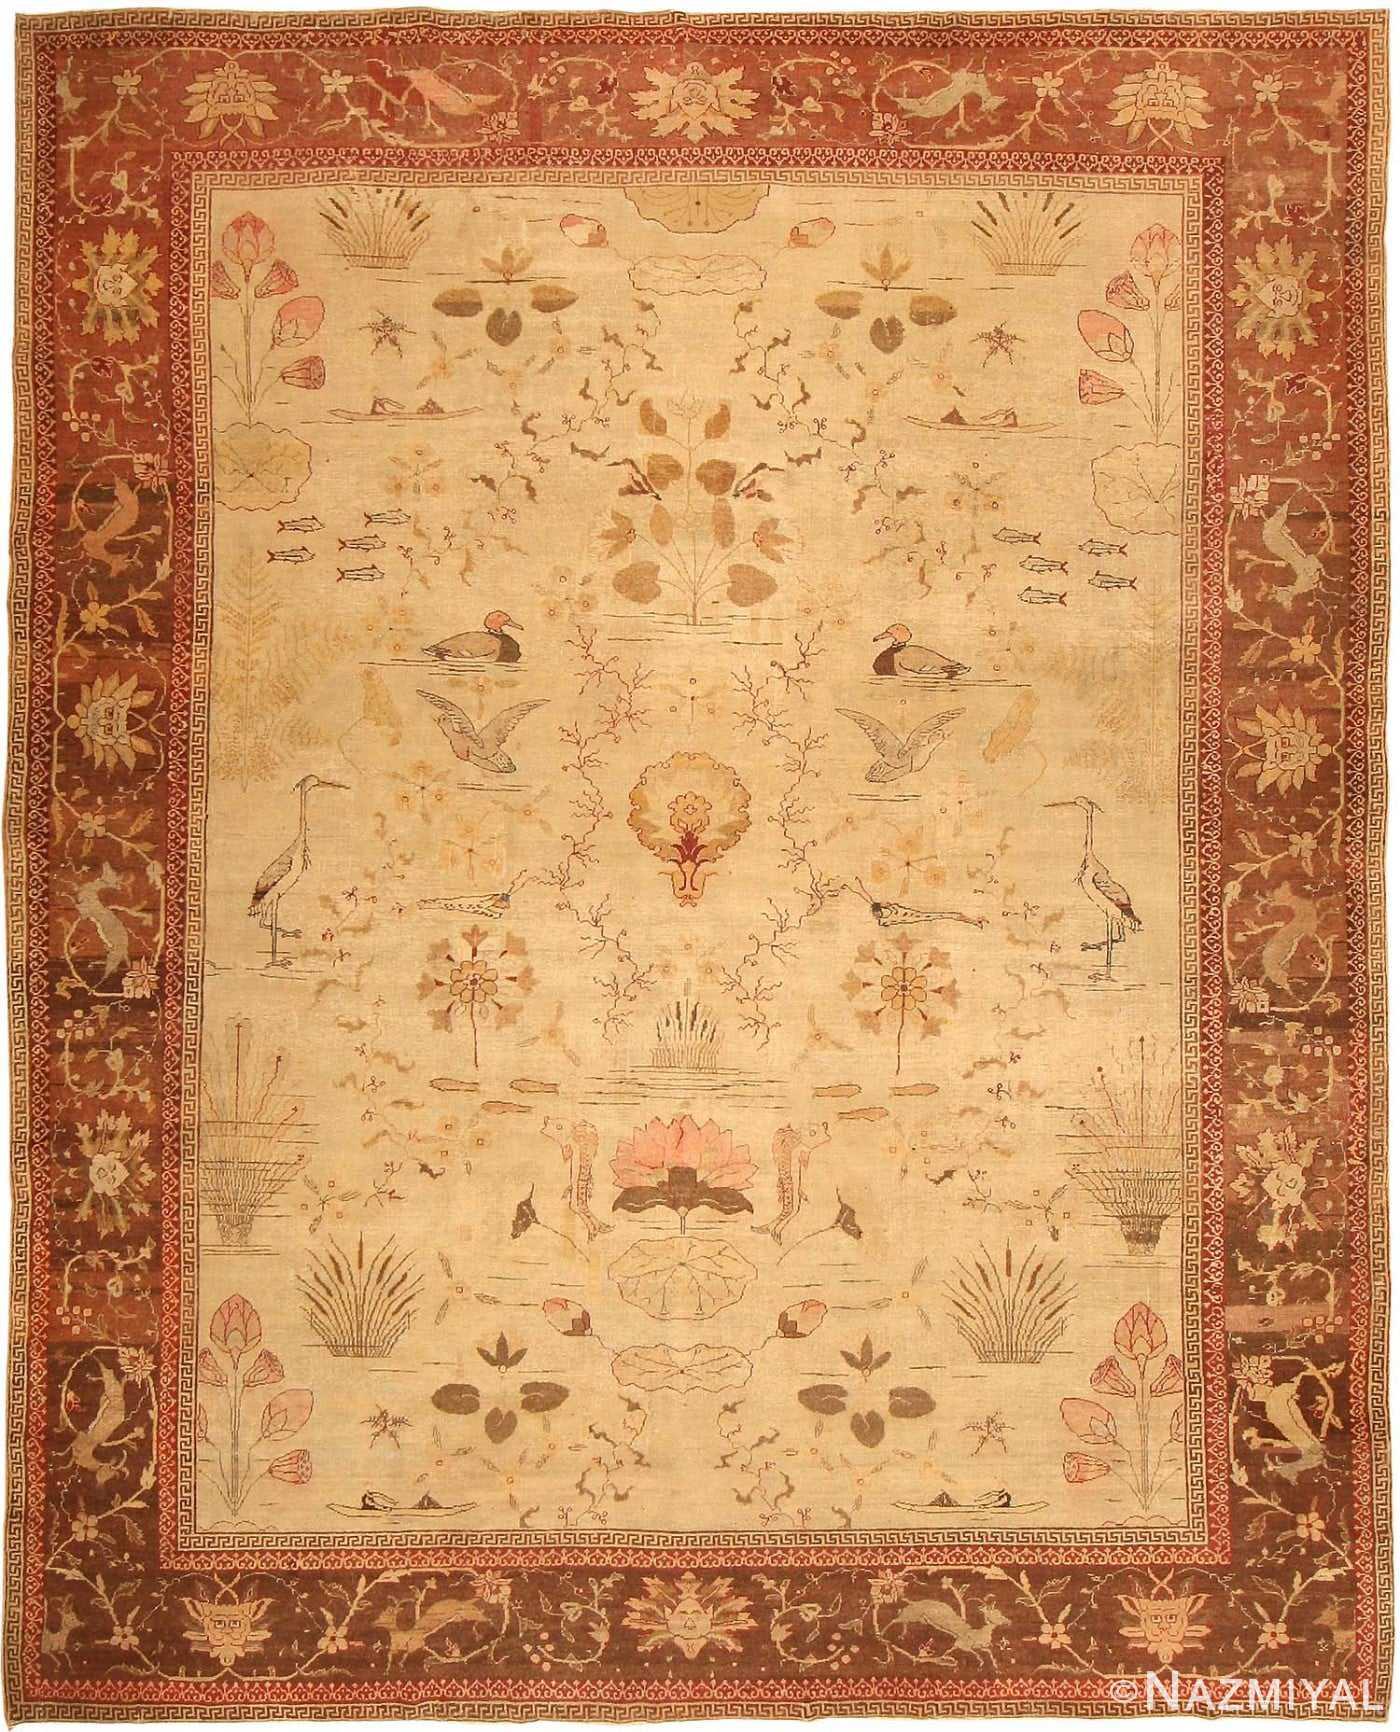 Antique Amritsar Rug 42169 Detail/Large View